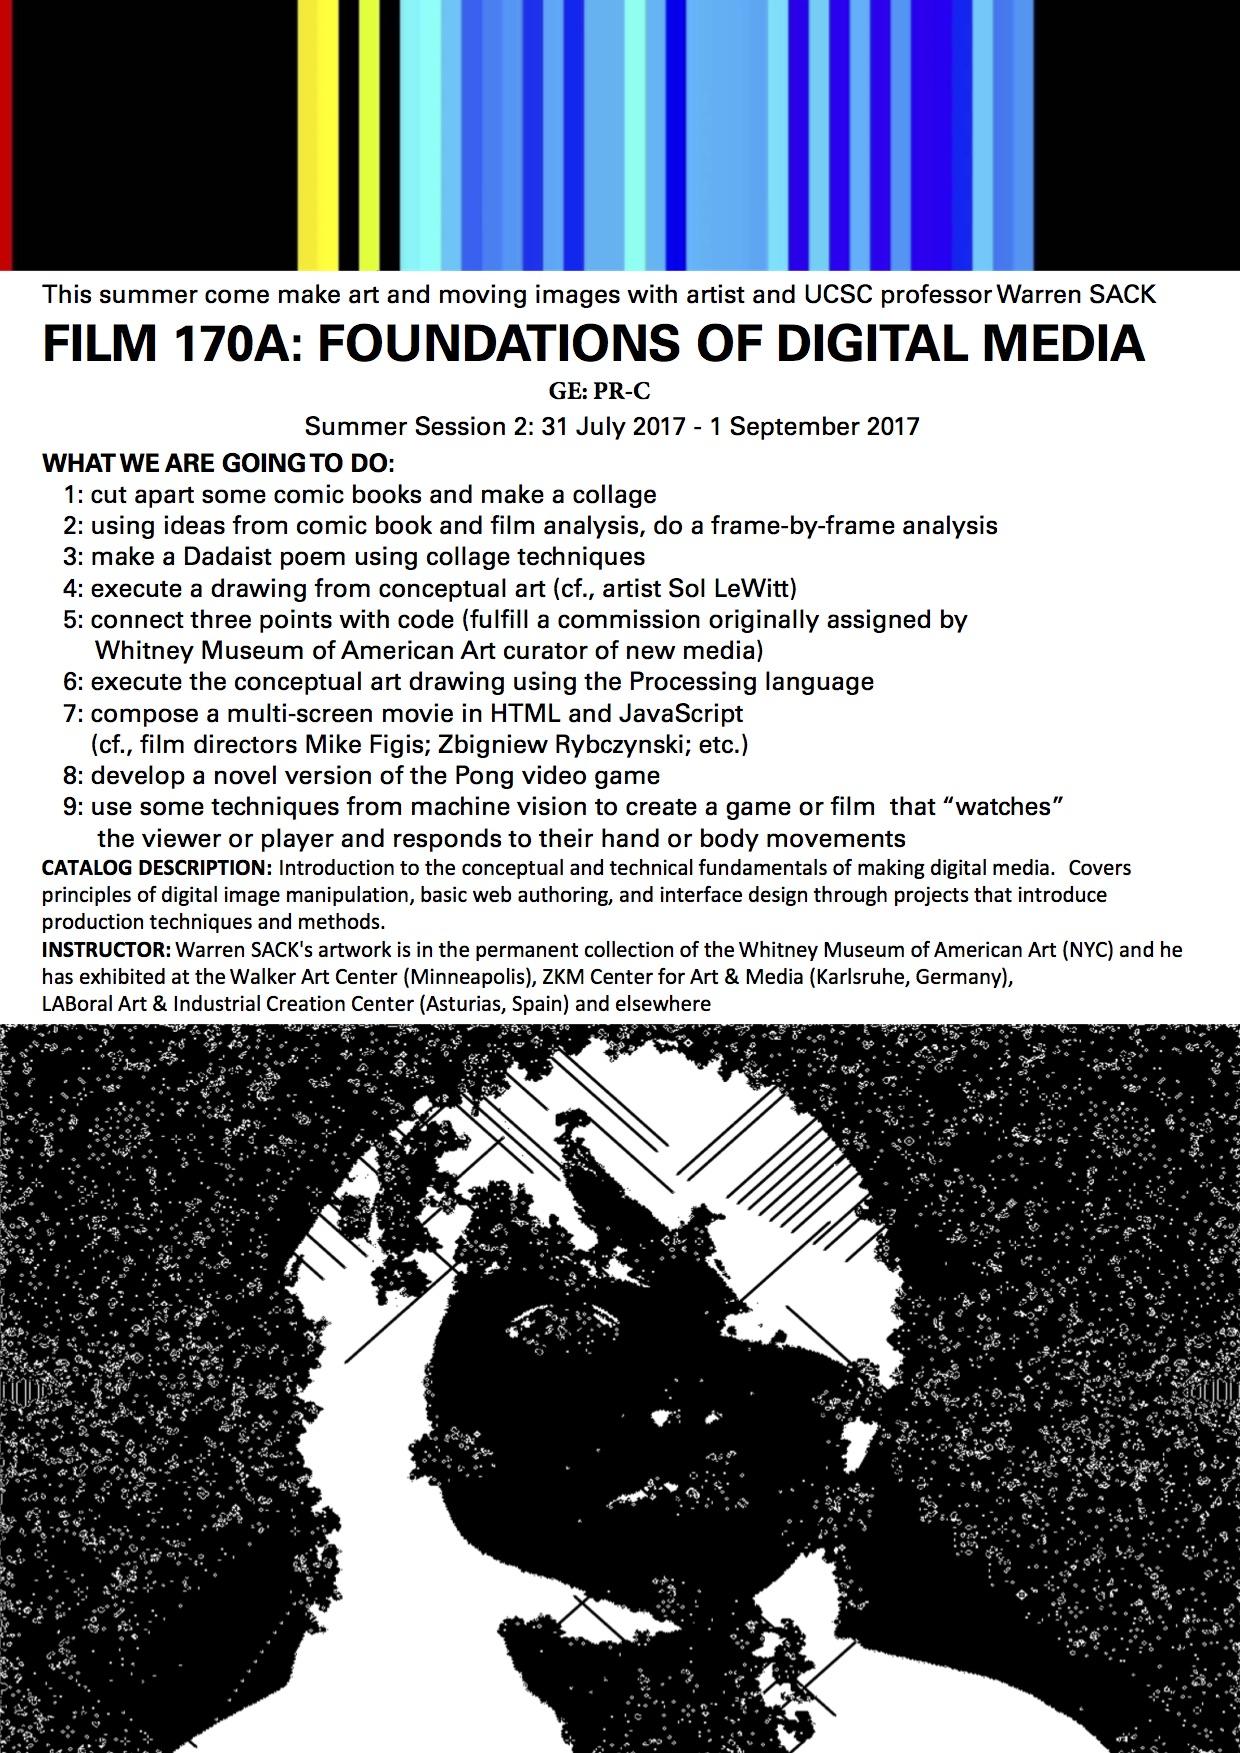 FILM 170A Summer session flyer